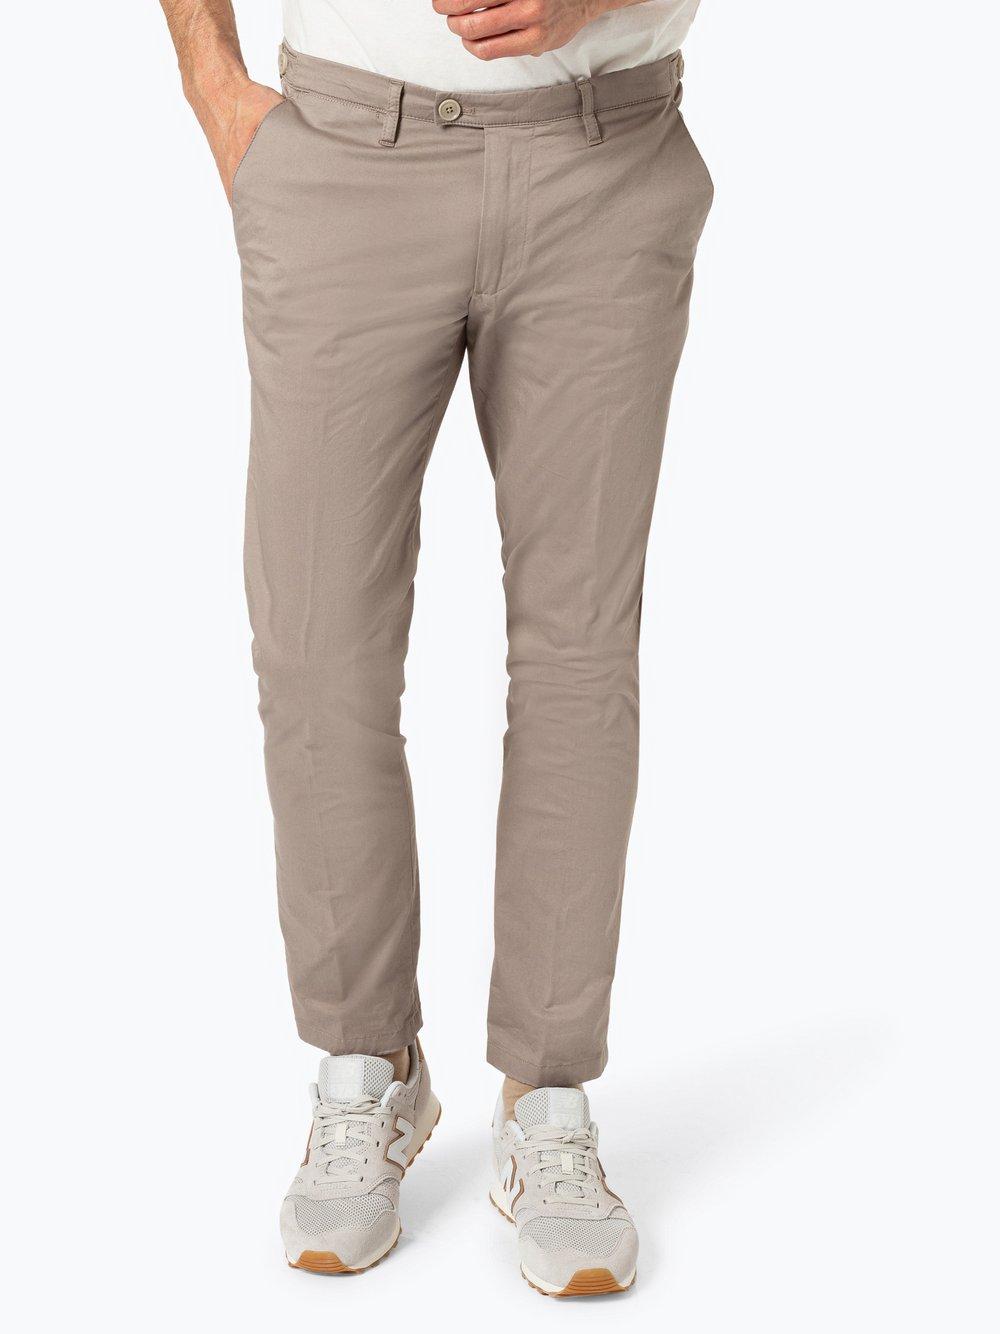 Drykorn - Spodnie męskie – Hoop_2, beżowy